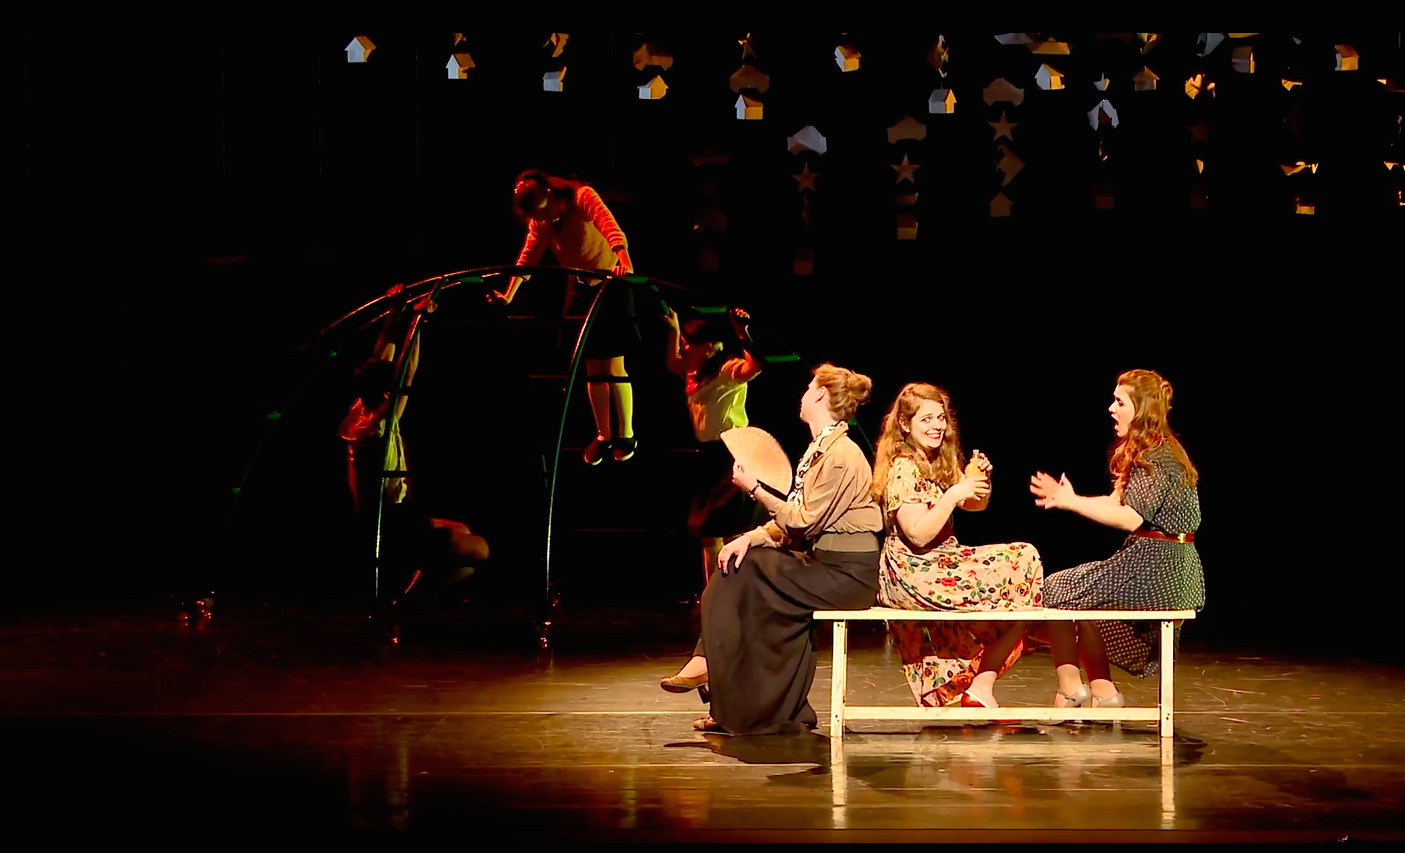 Image: Ellen Van Beek, Björk Níelsdóttir & Celine Purcell performing 'Question of Admonition' from 'Morning Blossoms'. October 11 2016, Theater De Spiegel, Zwolle.